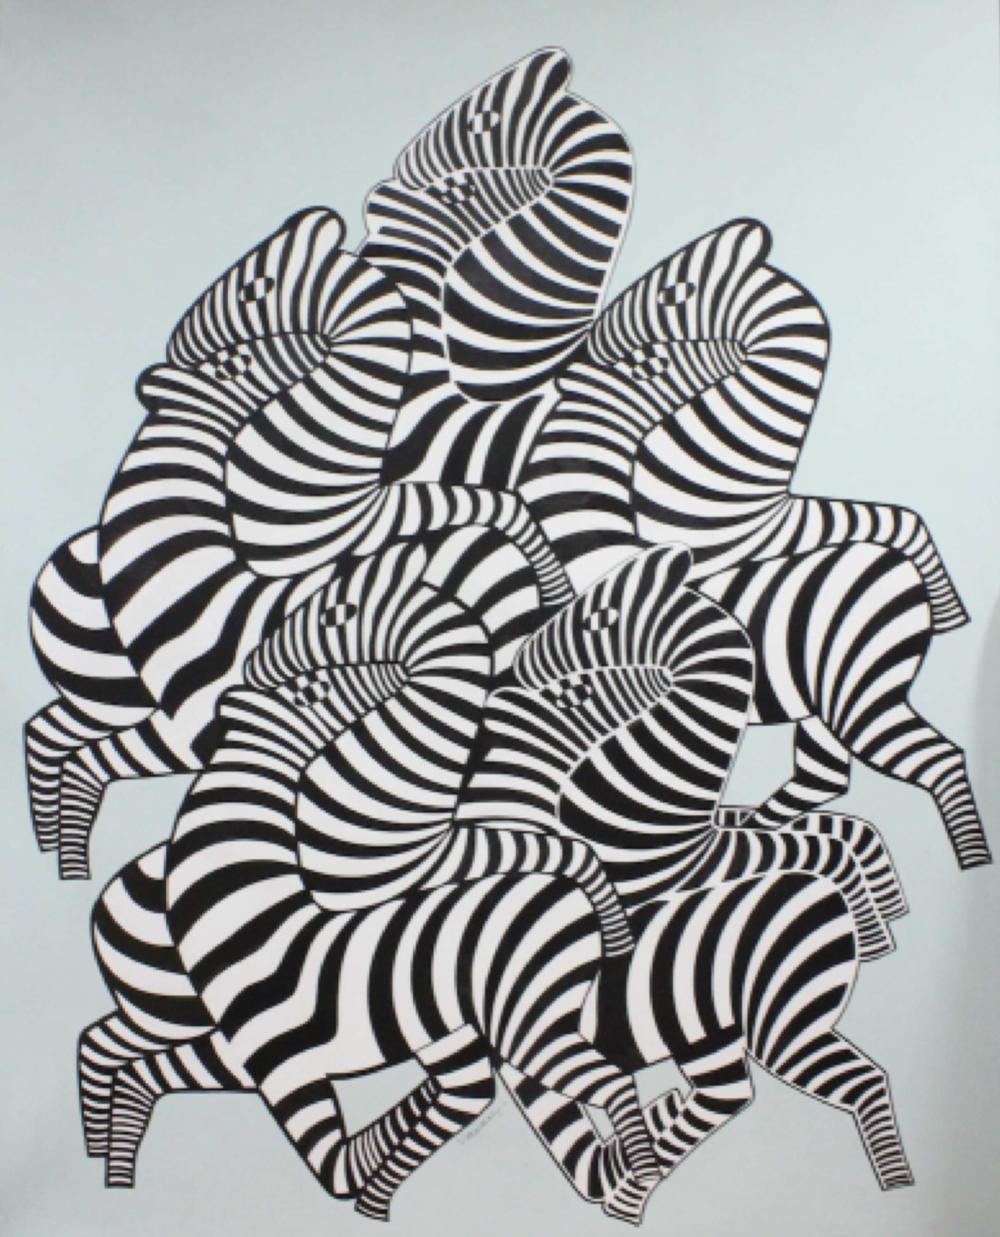 Multi-zèbres  , 1980  -  144 x 116 cm   SOLD